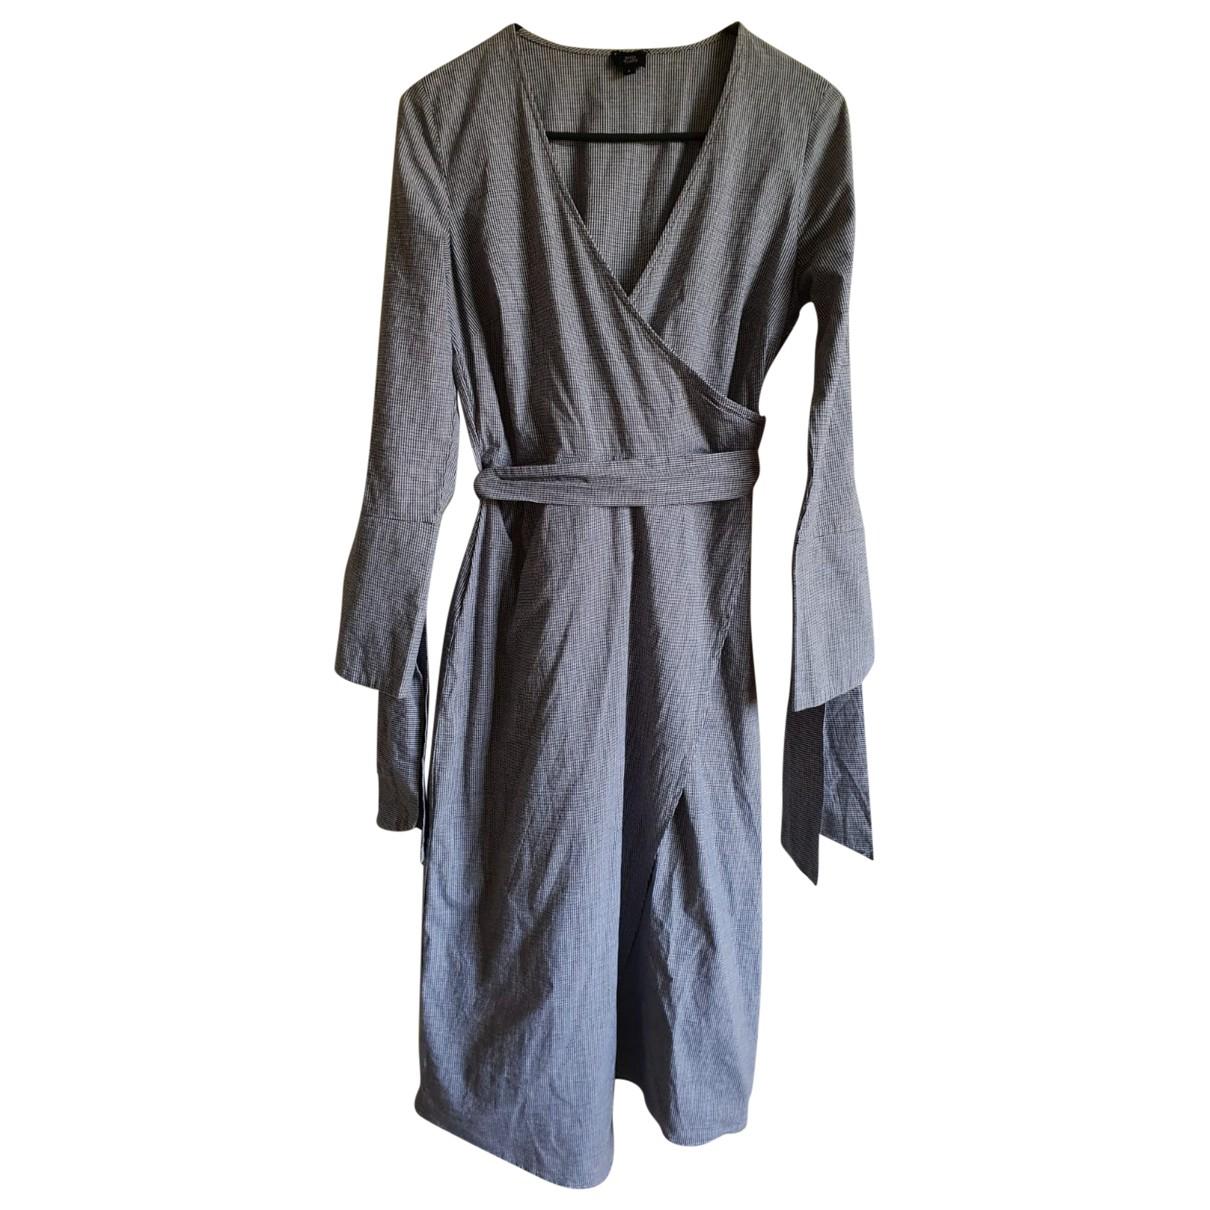 River Island \N Blue dress for Women 36 FR